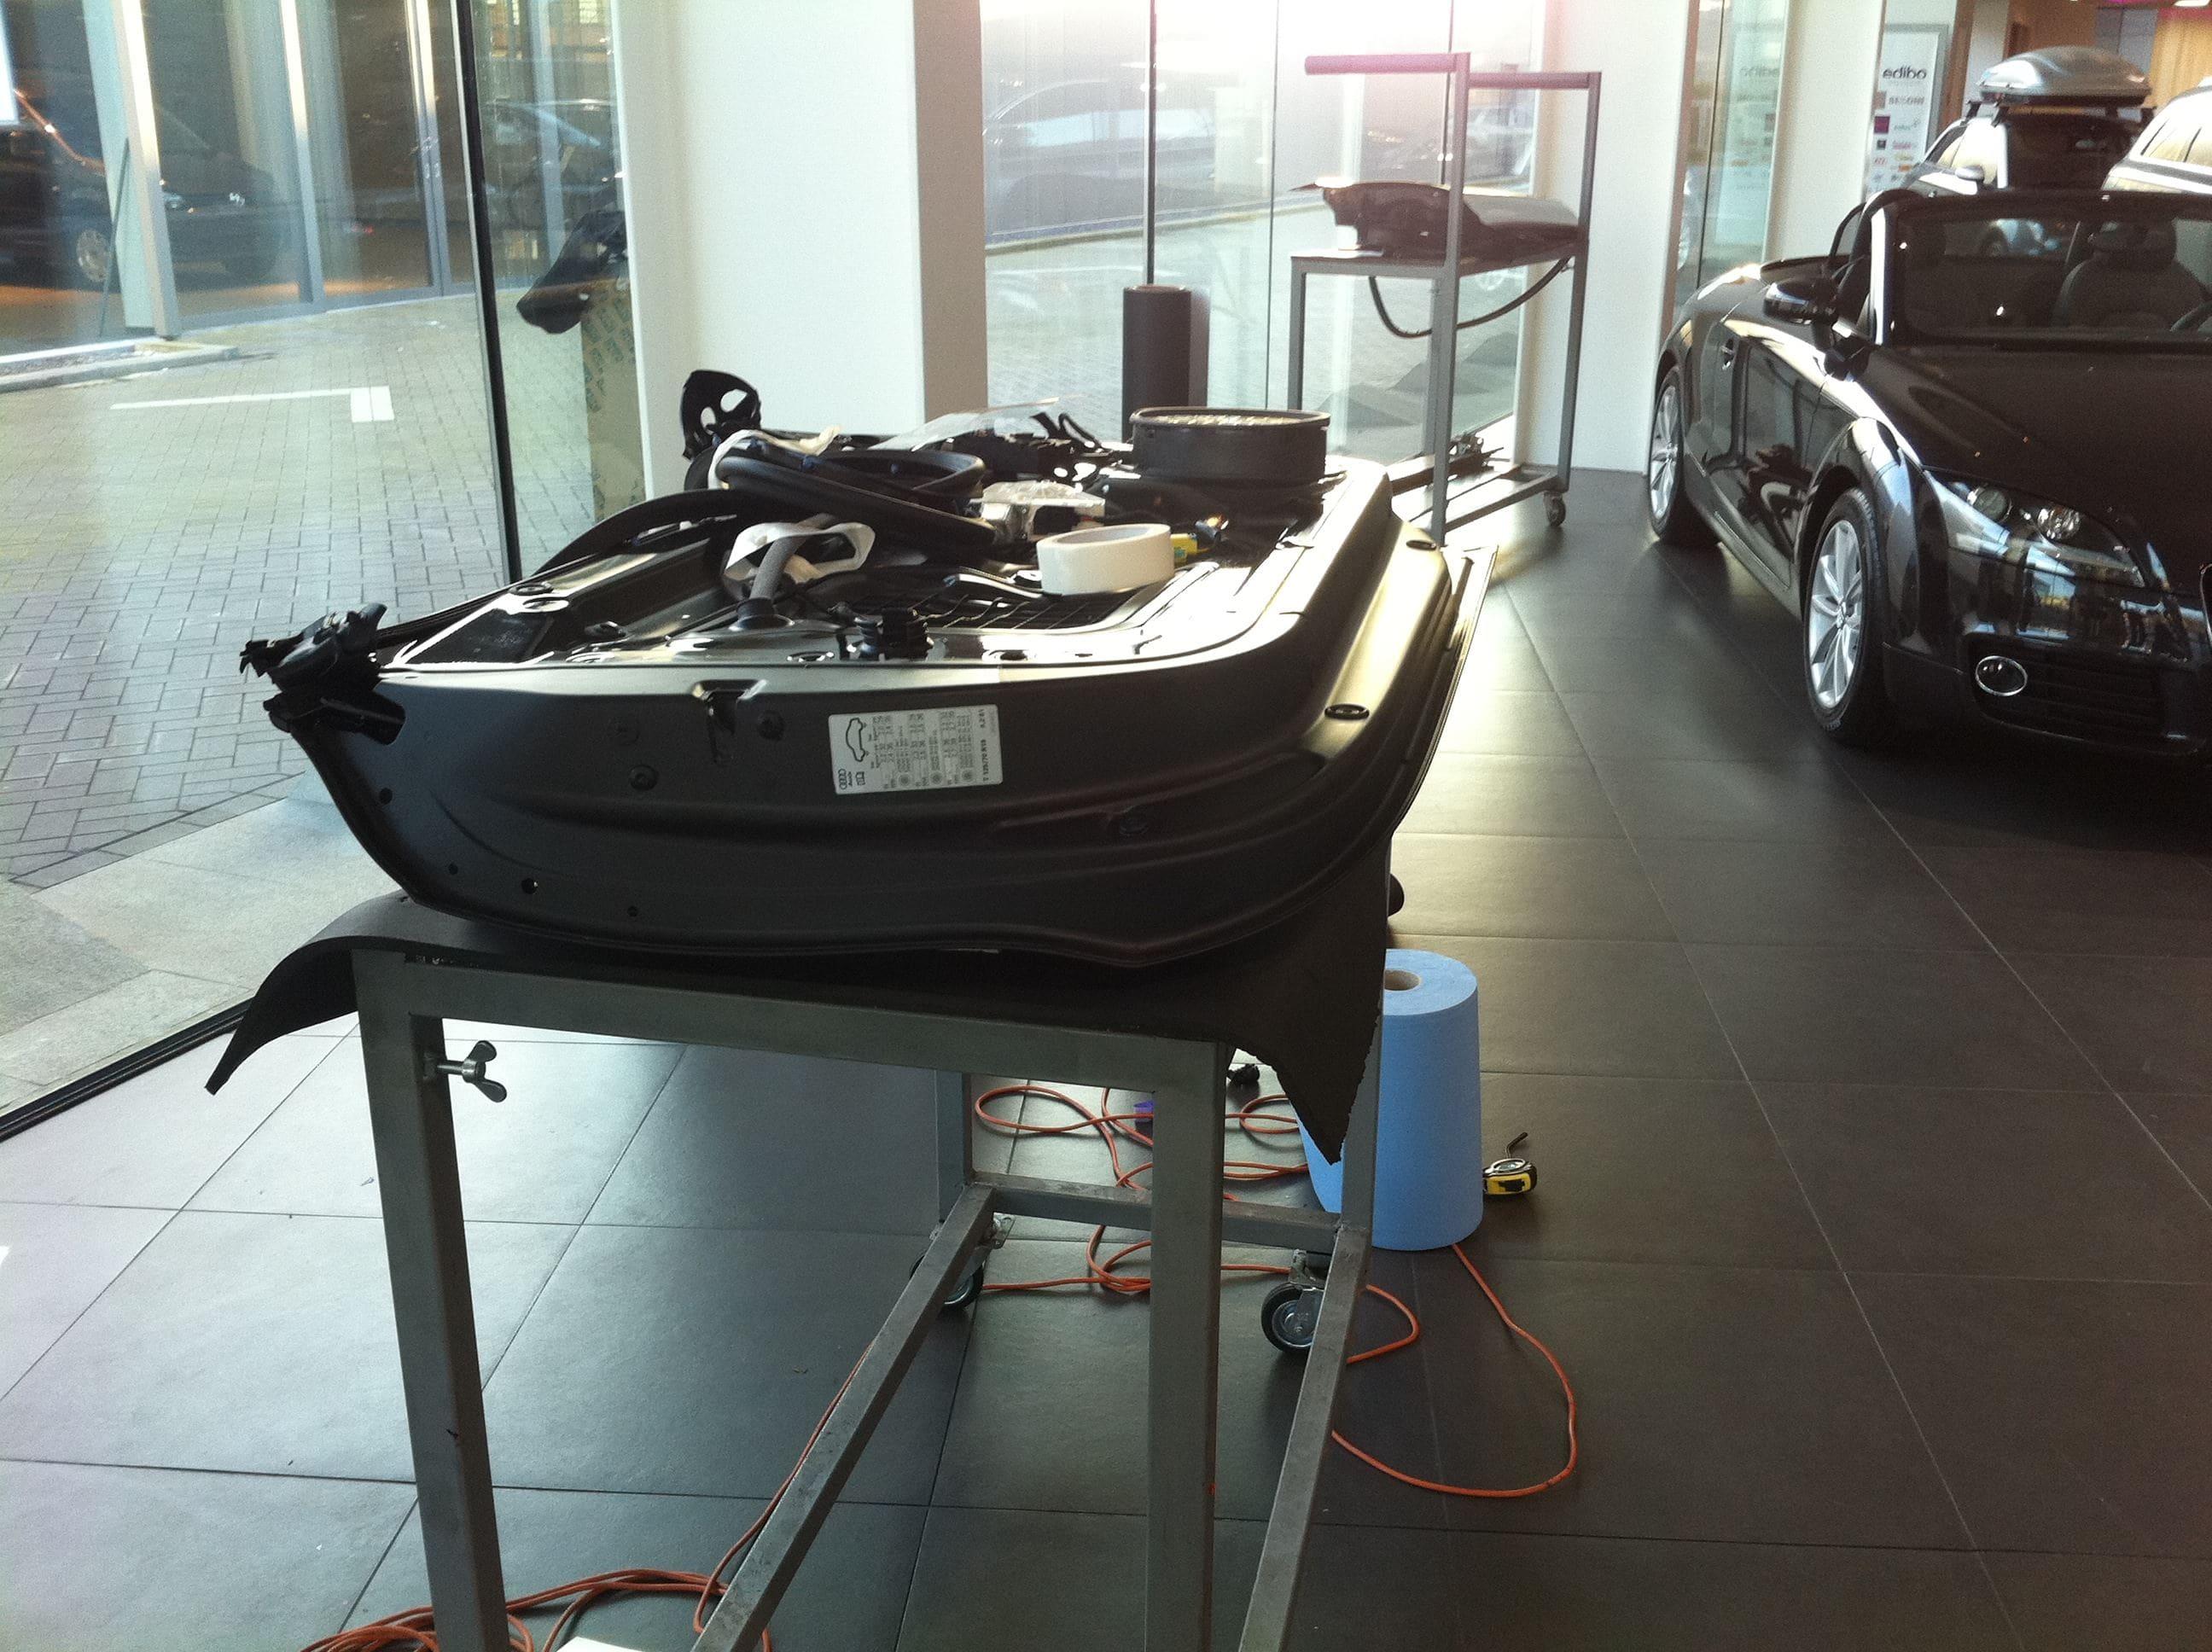 Audi A5 Coupe met Mat Zwarte Wrap, Carwrapping door Wrapmyride.nu Foto-nr:4584, ©2021